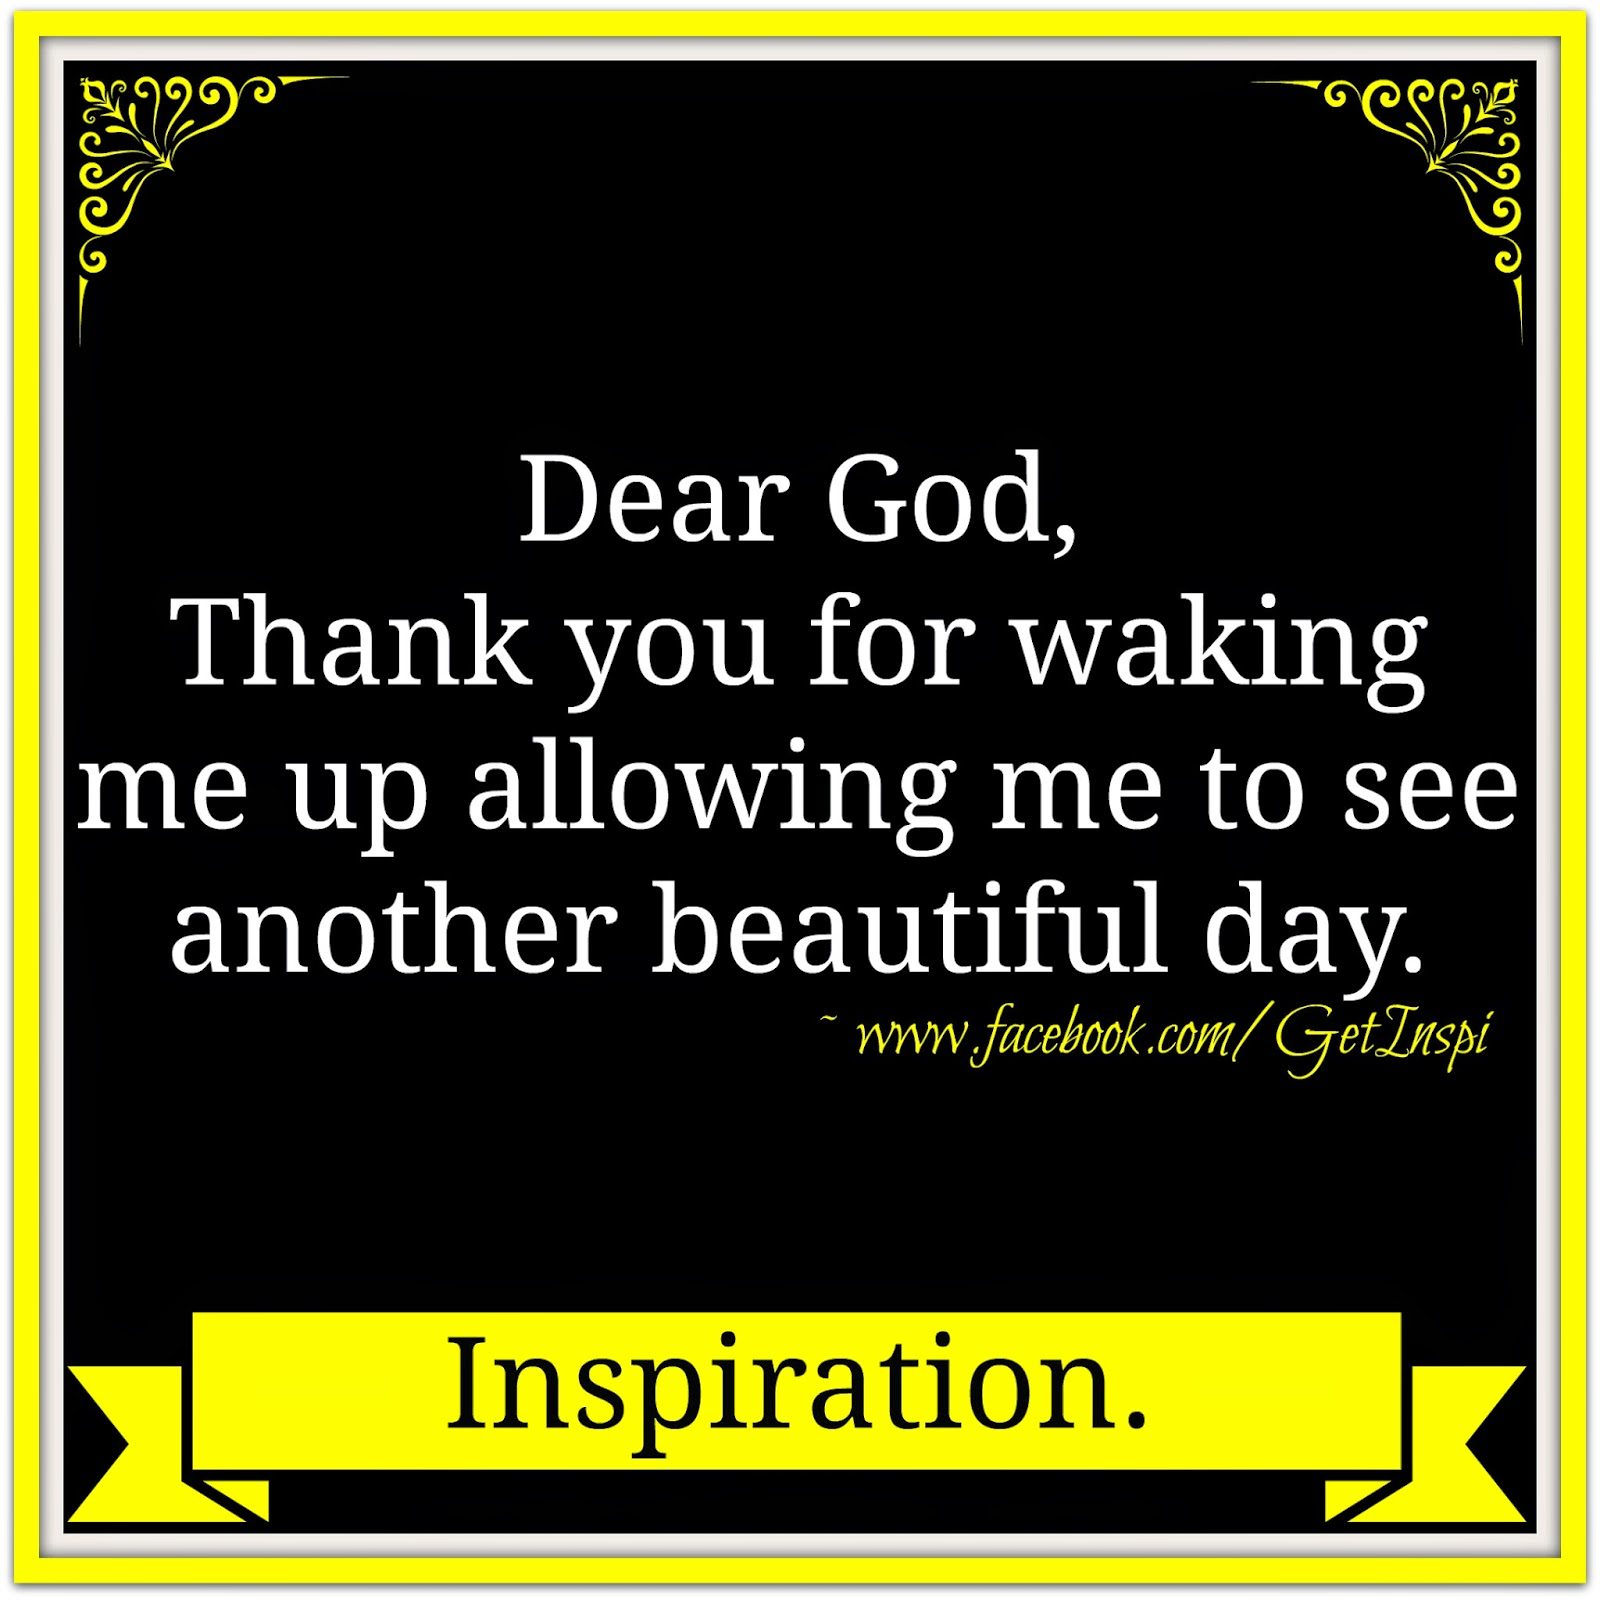 Inspirational and Random Quotes: Dear God !!